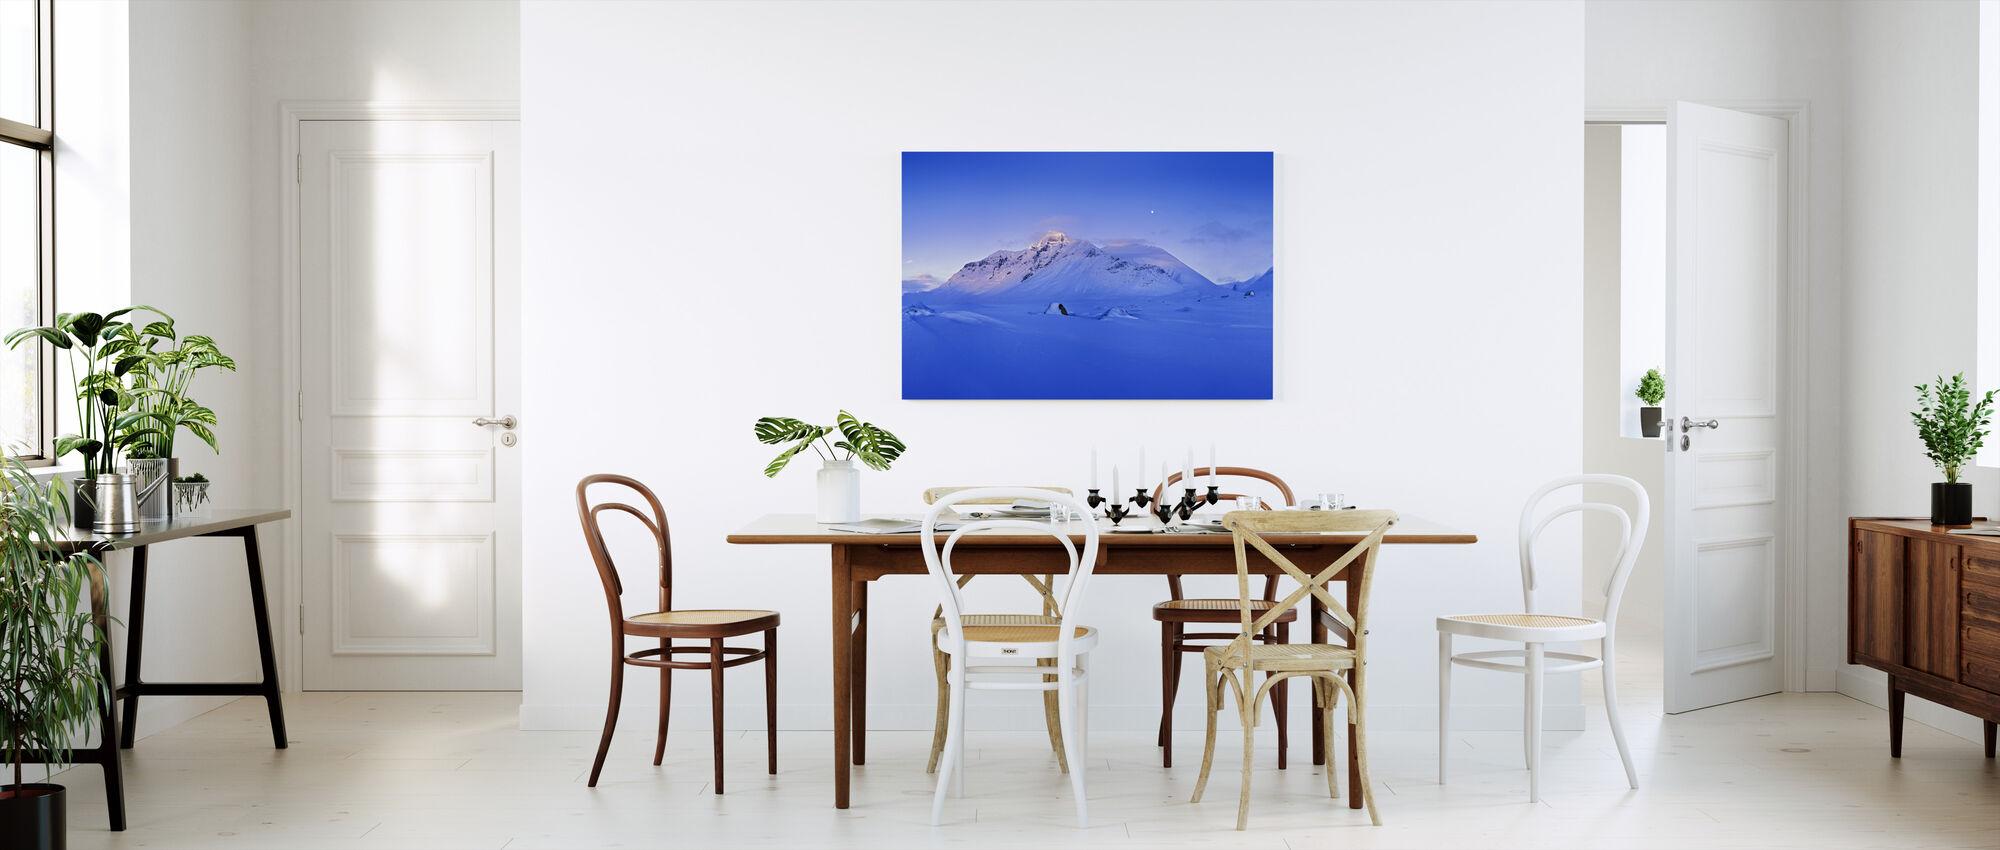 Blå afton i Sarek, Sverige, Europa - Canvastavla - Kök